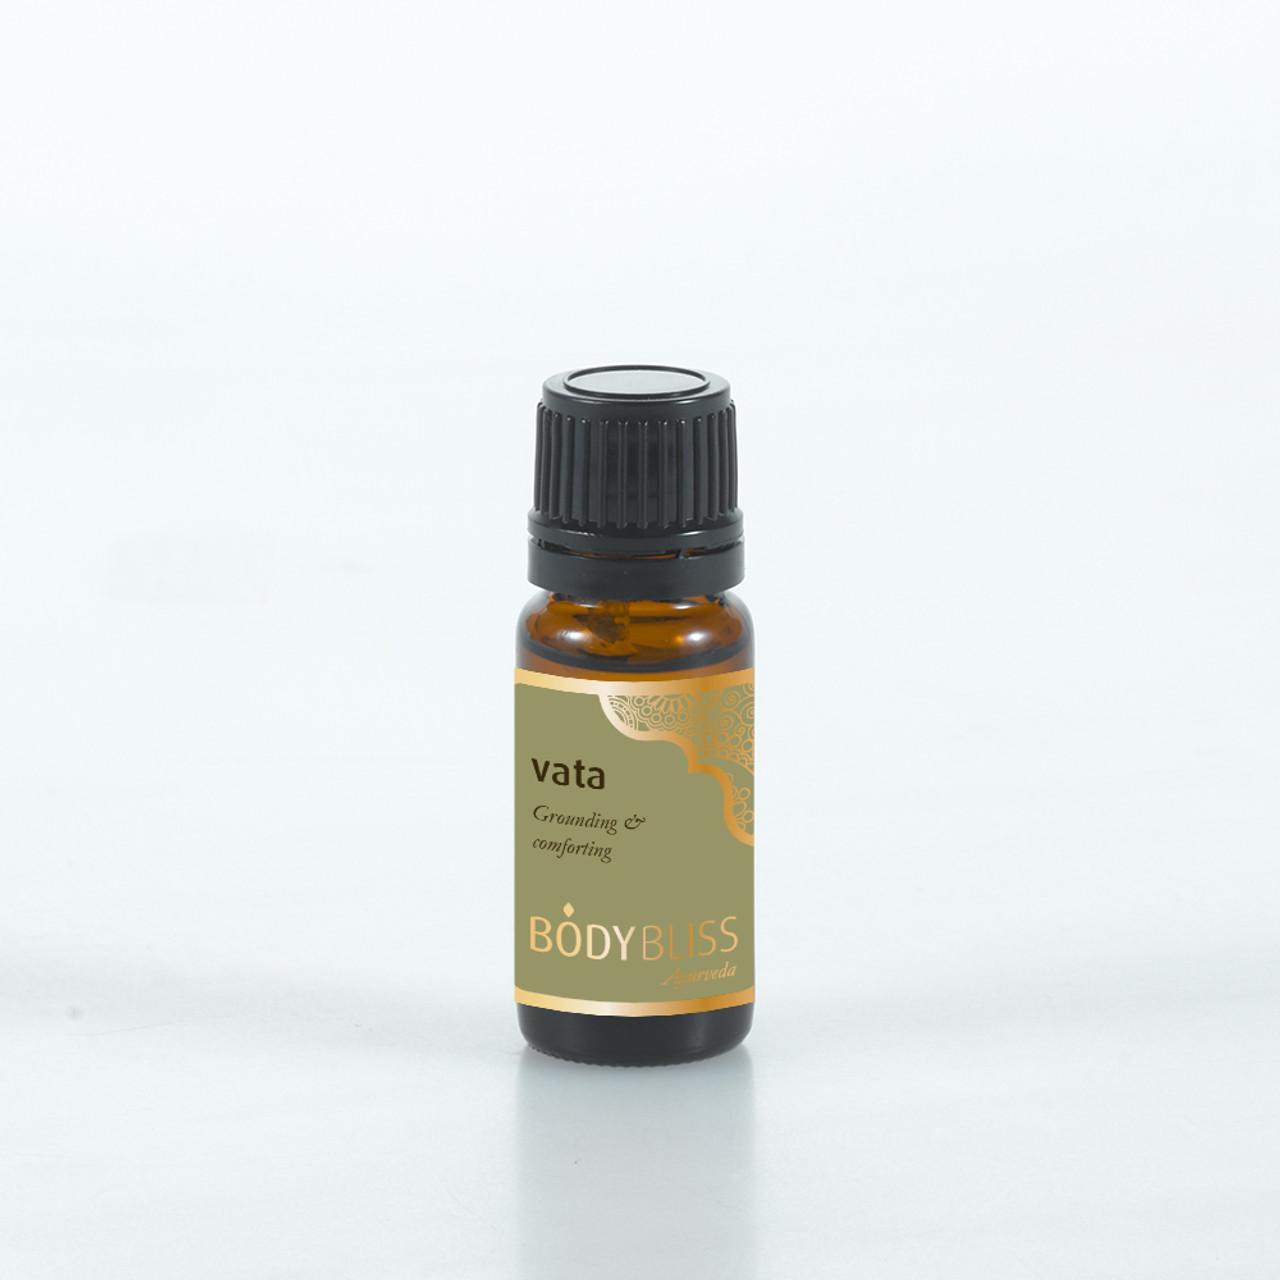 Vata Balancing Ayurveda Essential Oil Blend